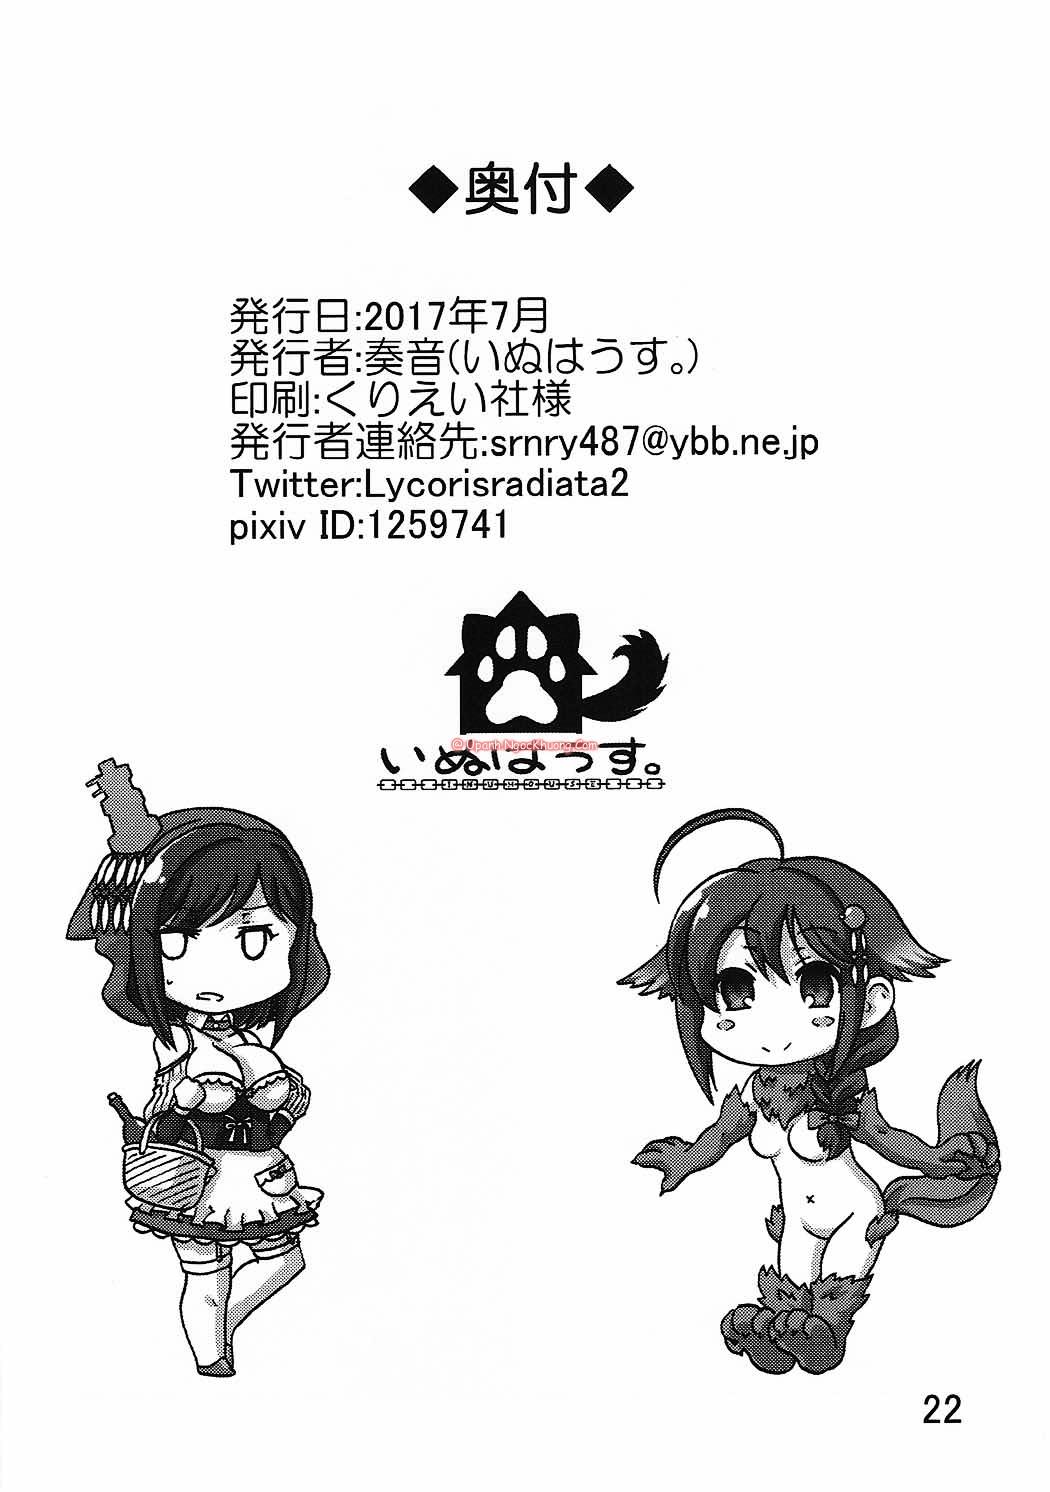 Hình ảnh 40331926071_e616c17bde_o trong bài viết Shigure wa Ookami Zen Yamazukin-chan Ki oTsukete